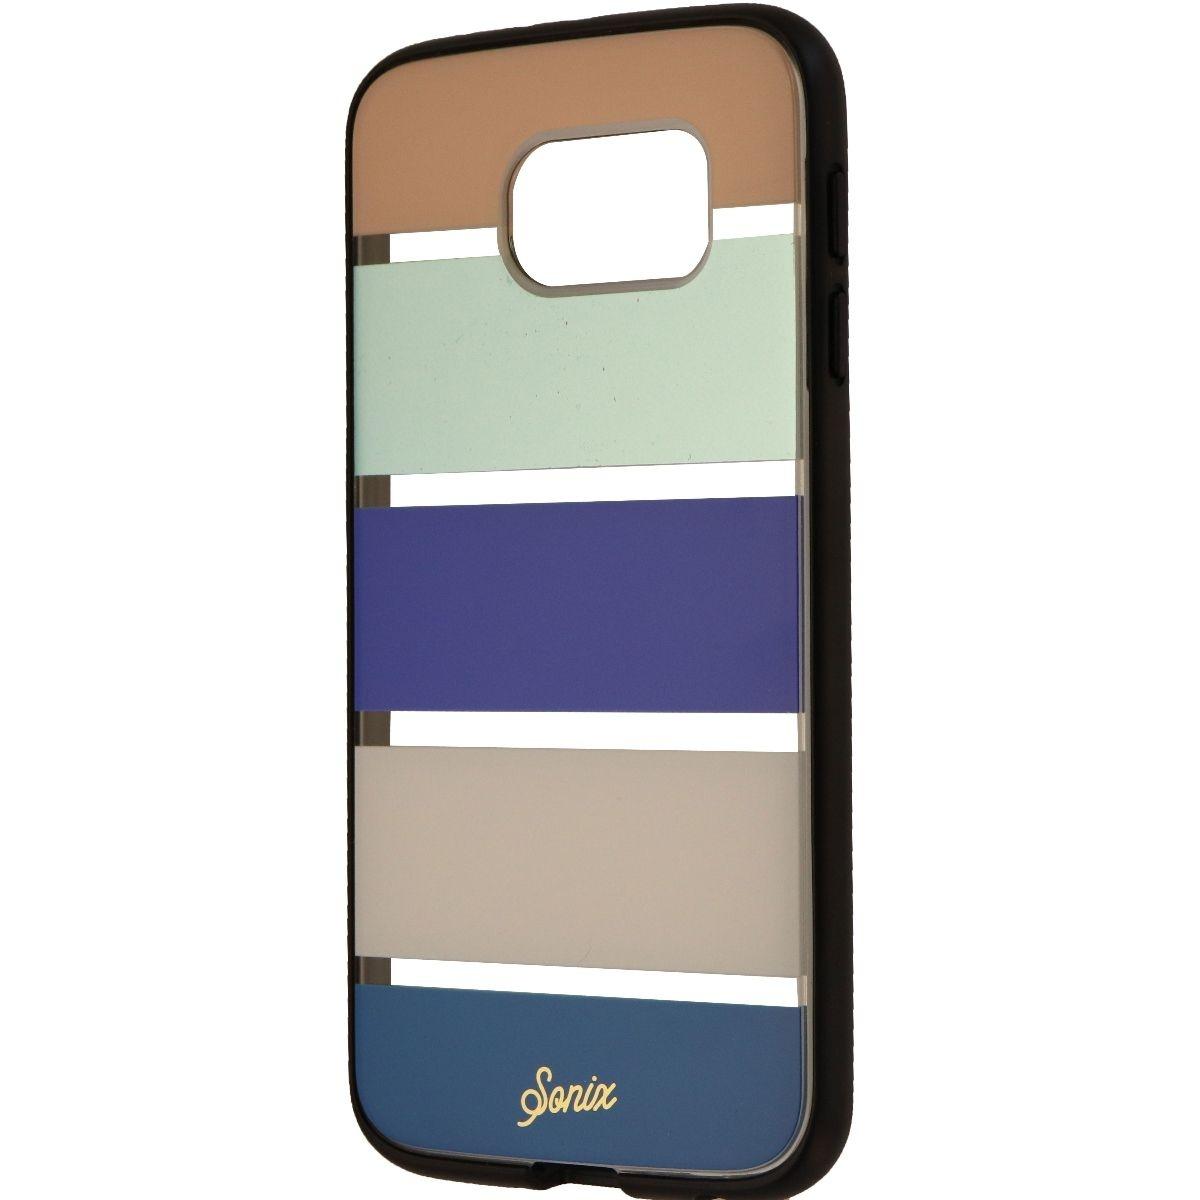 low priced d8402 07e52 Sonix Clear Coat Case for Samsung Galaxy S6 - Bondi Stripe